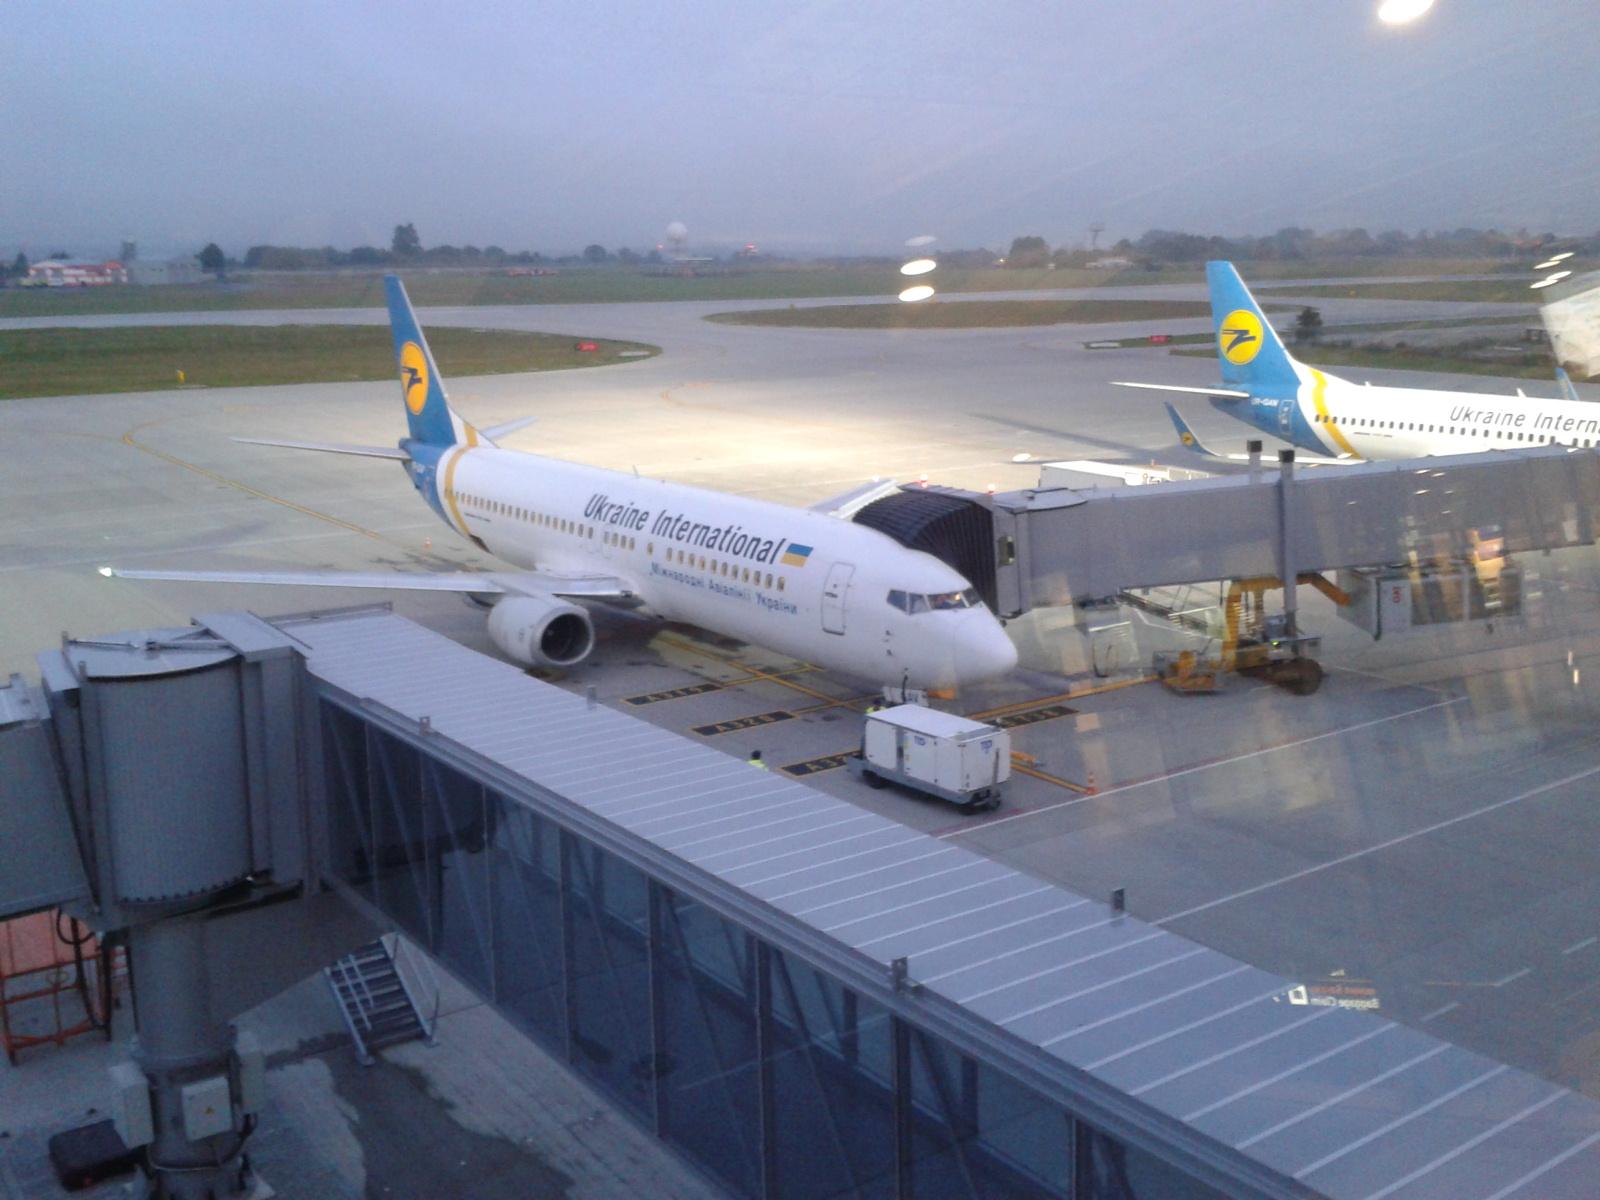 Боинг-737-400 МАУ в аэропорту Львов